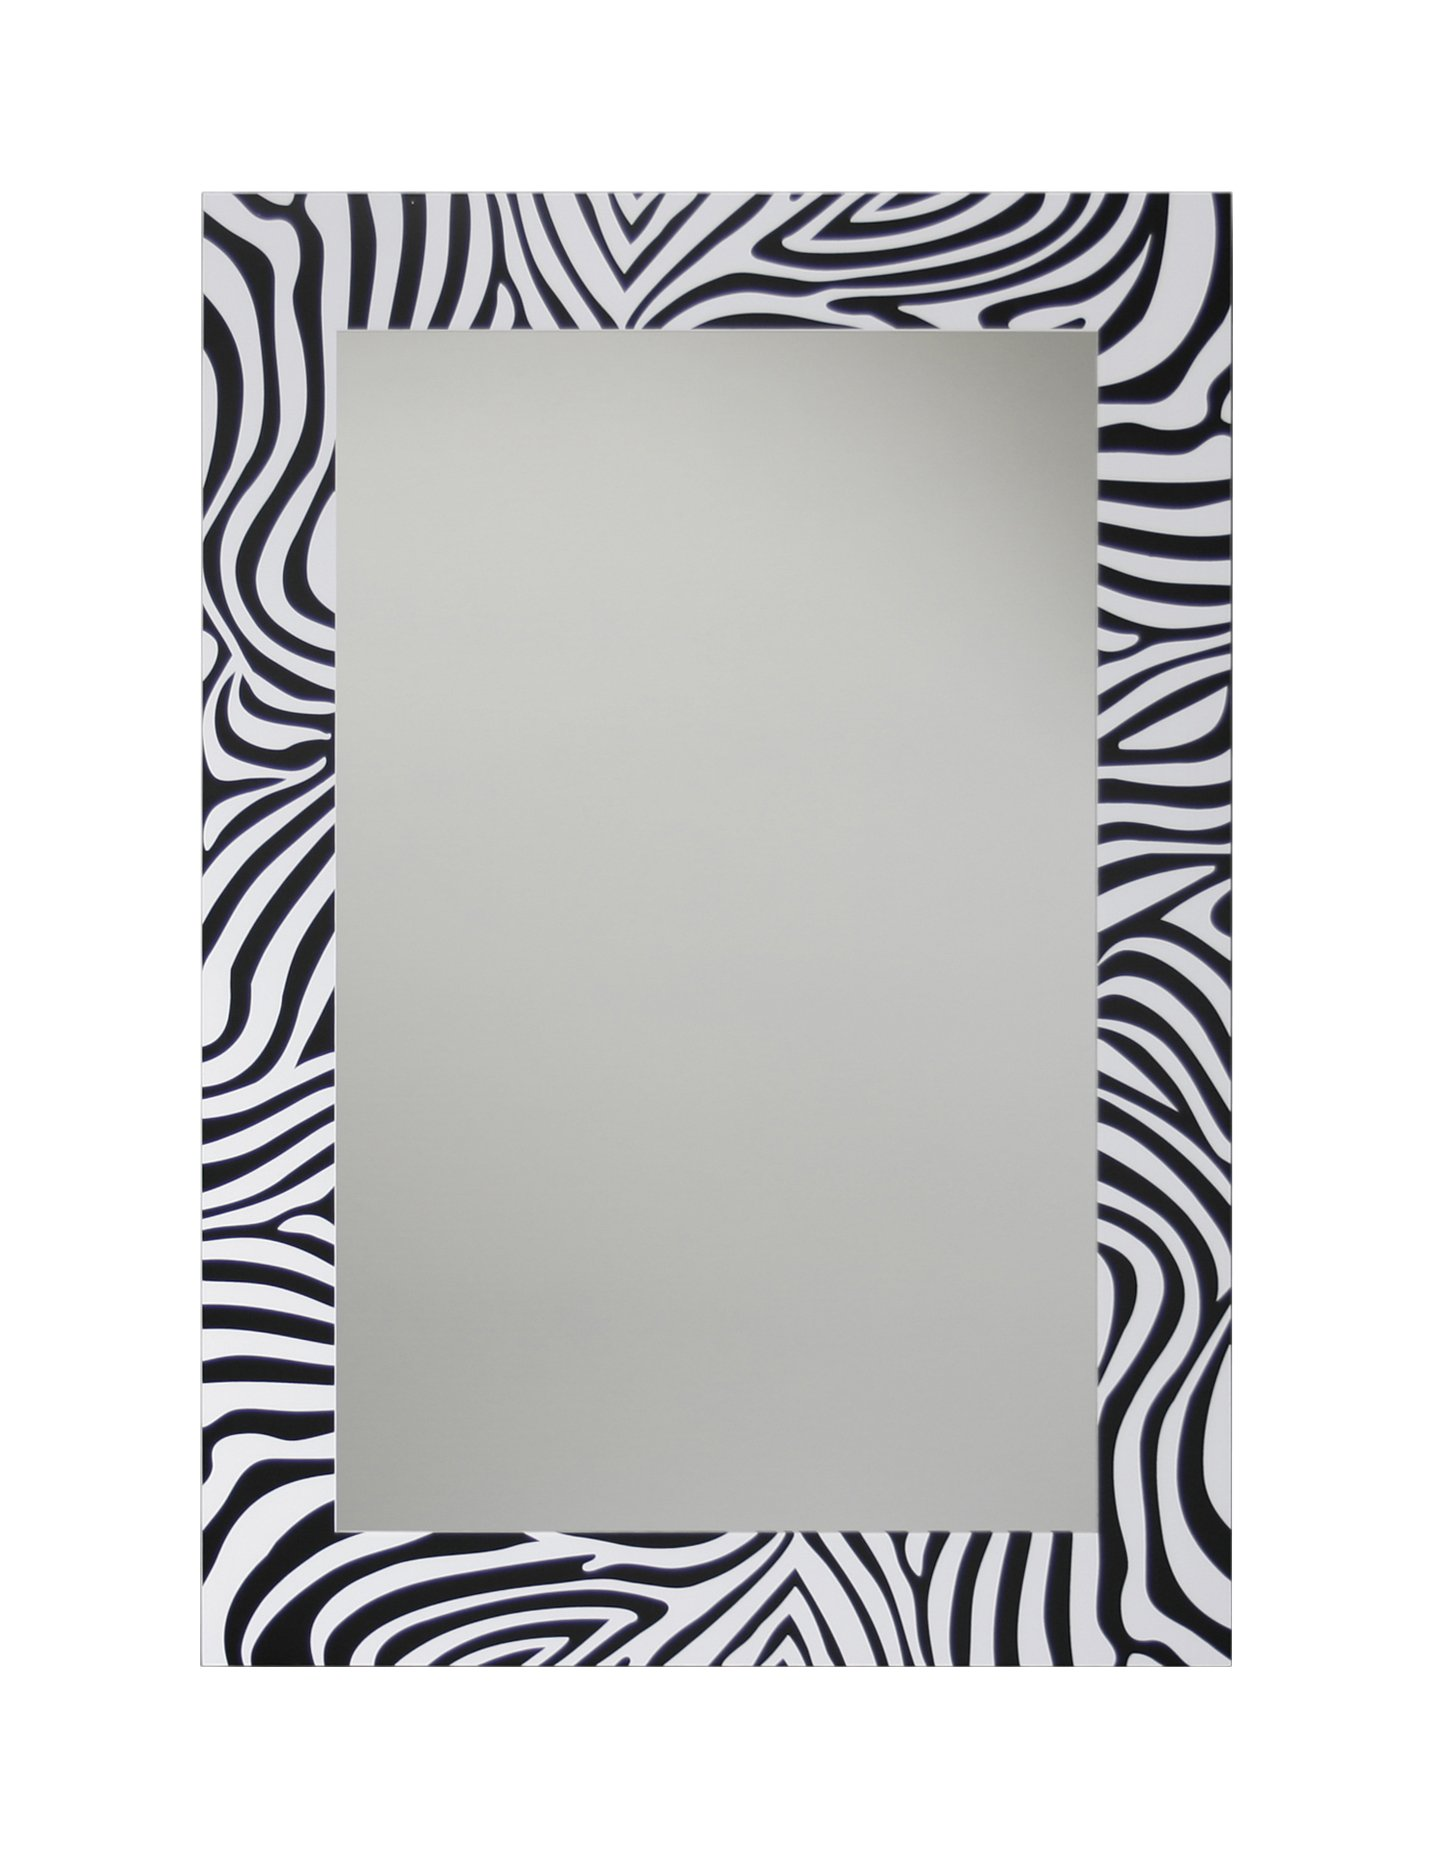 Leick Zebra Decorative Wall Mirror, 20'' x 28'' Black/White